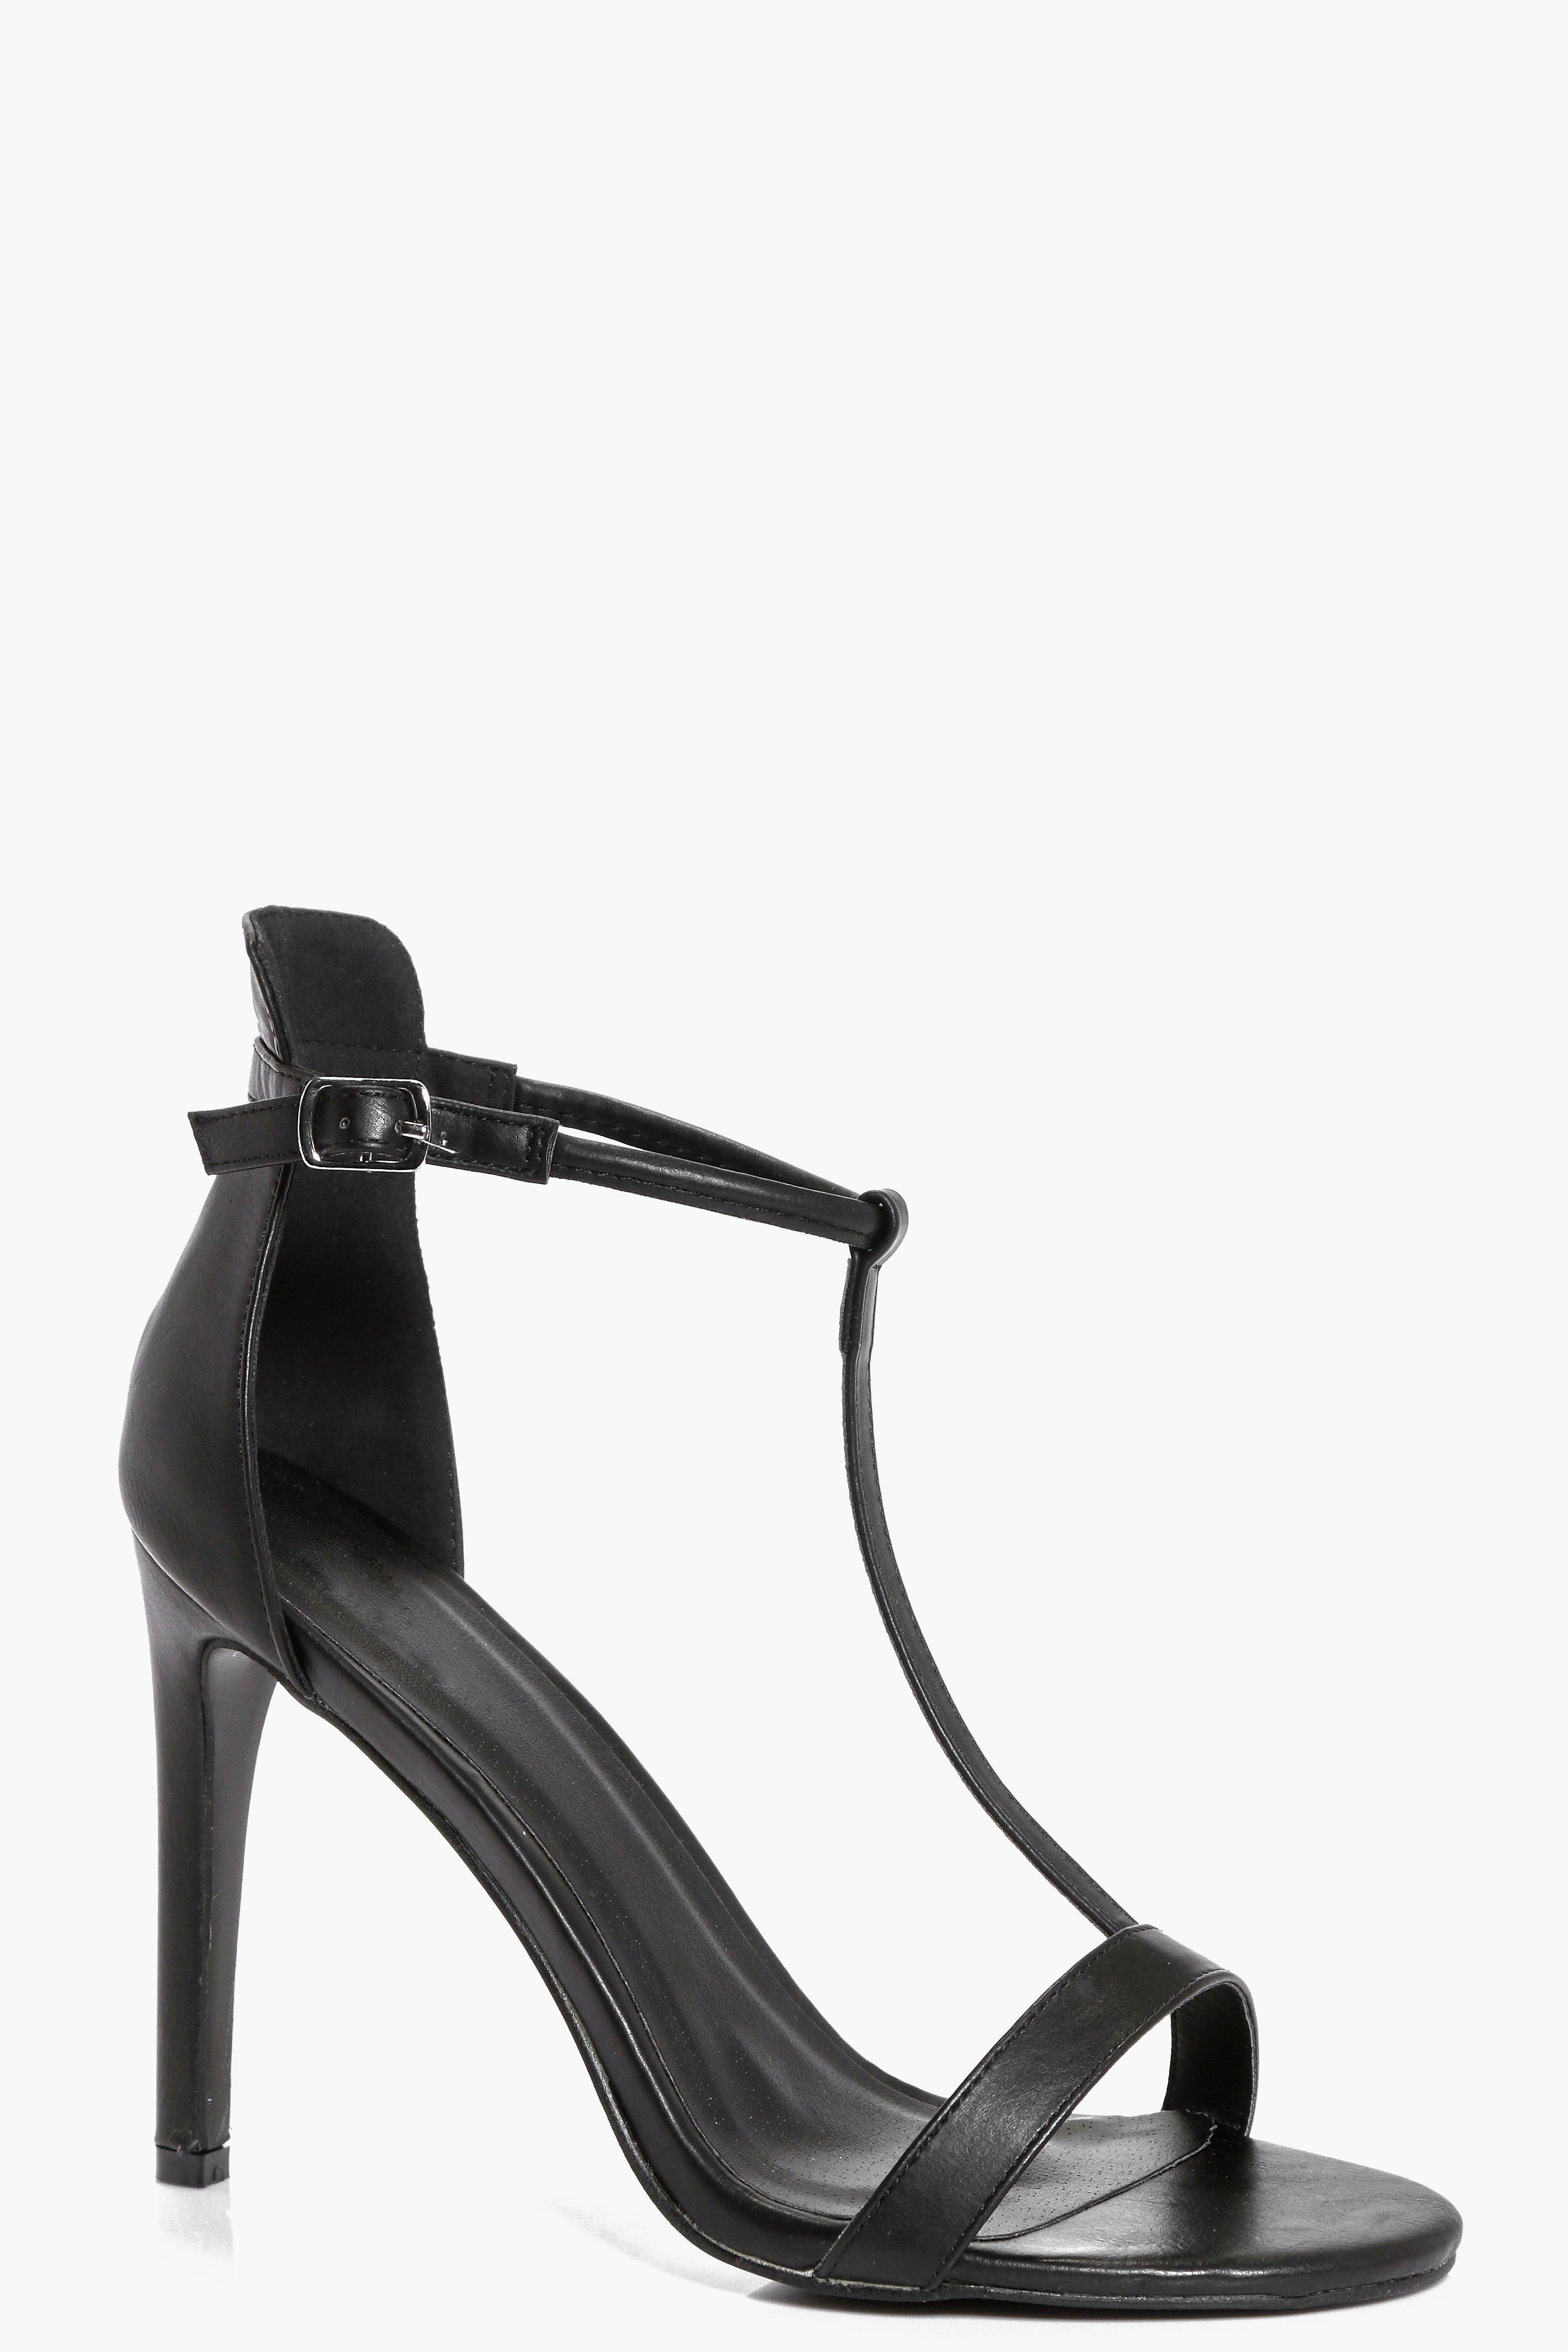 boohoo T Bar Stiletto Shoes - black